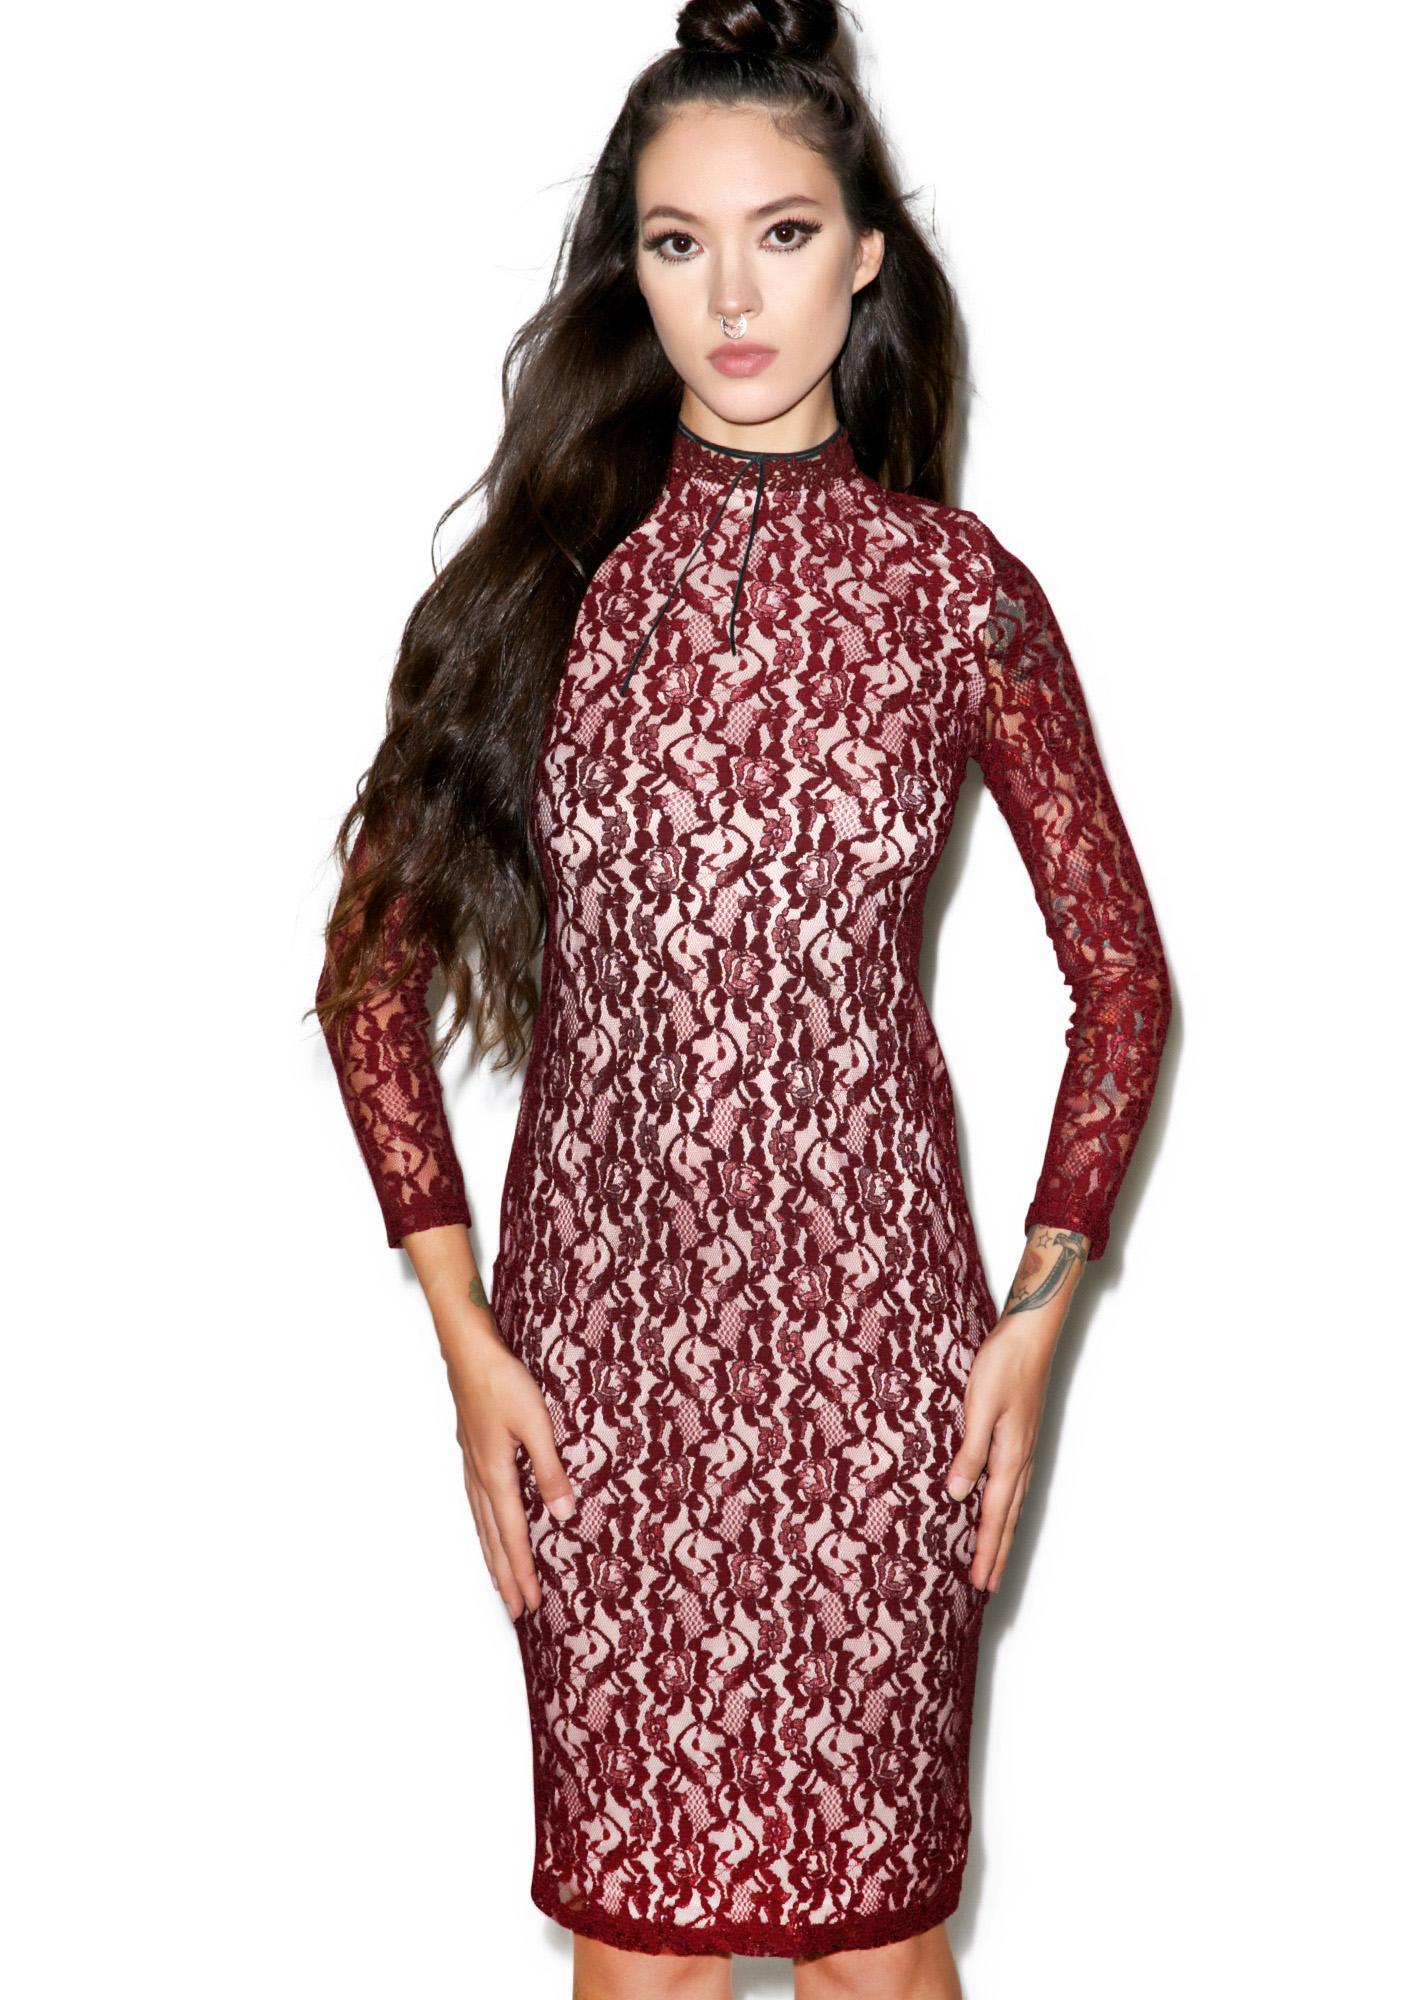 Glamorous Come Alive Dress